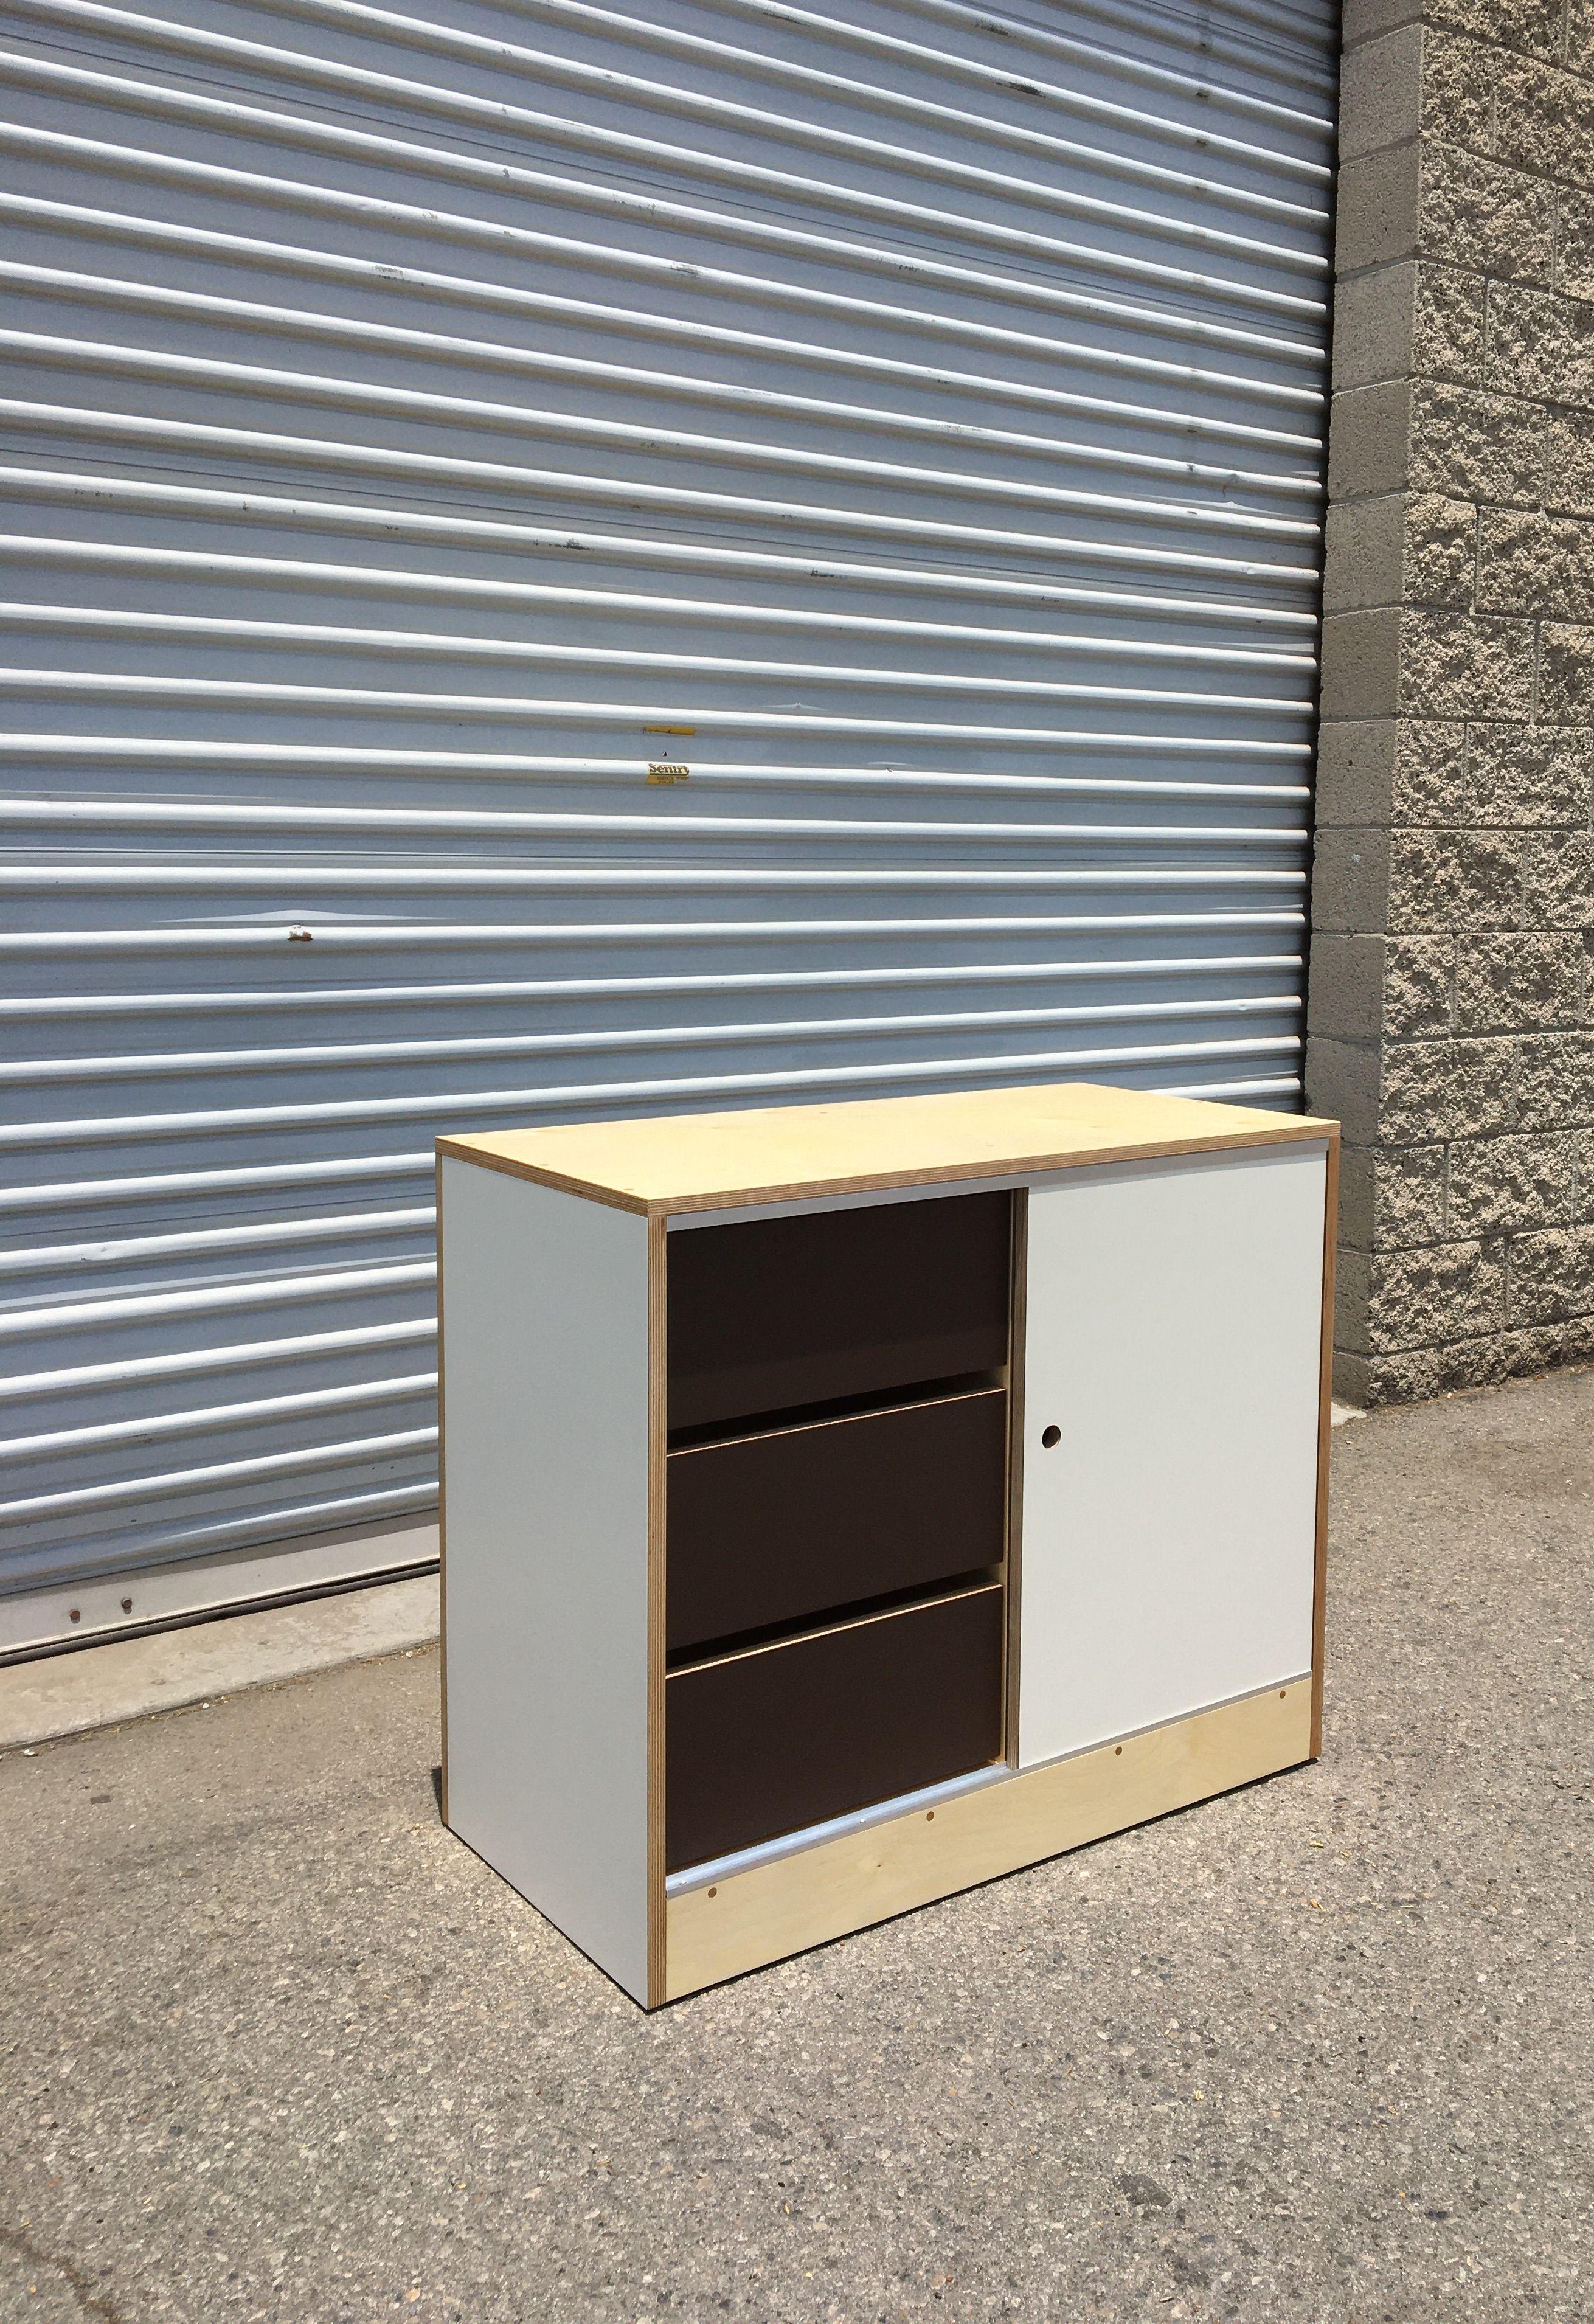 Sliding Door Storage Unit product image 1